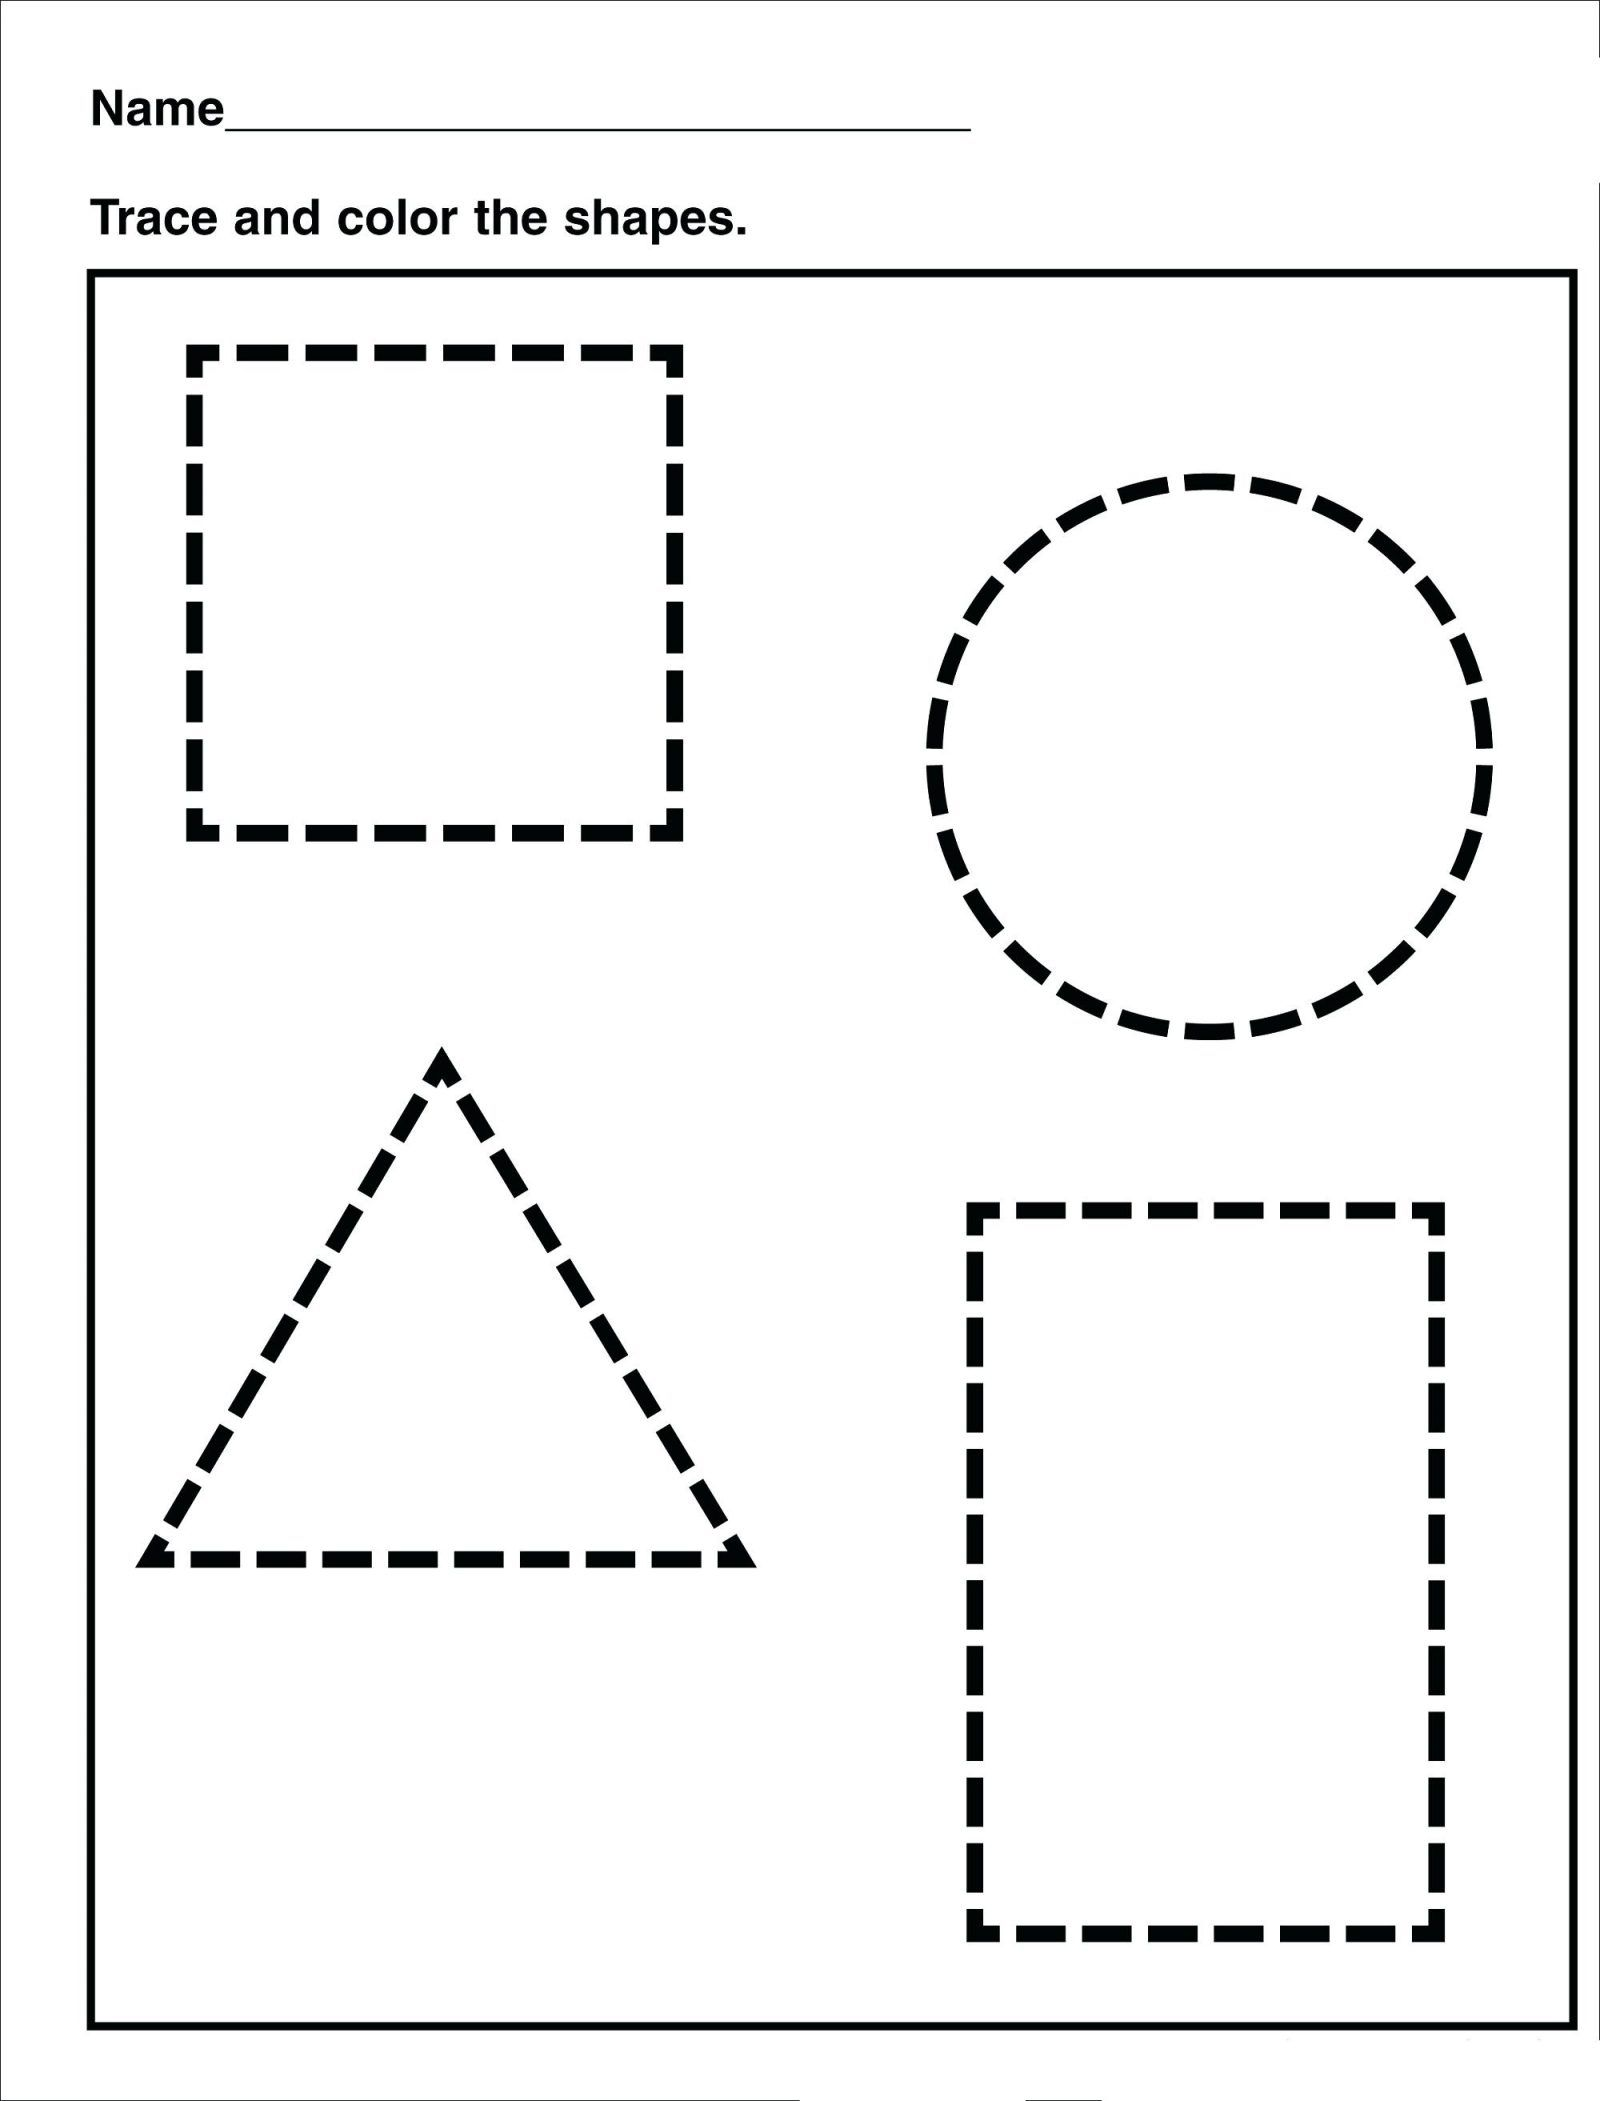 Tracing Shape Tracing Preschool Free Printable Worksheets